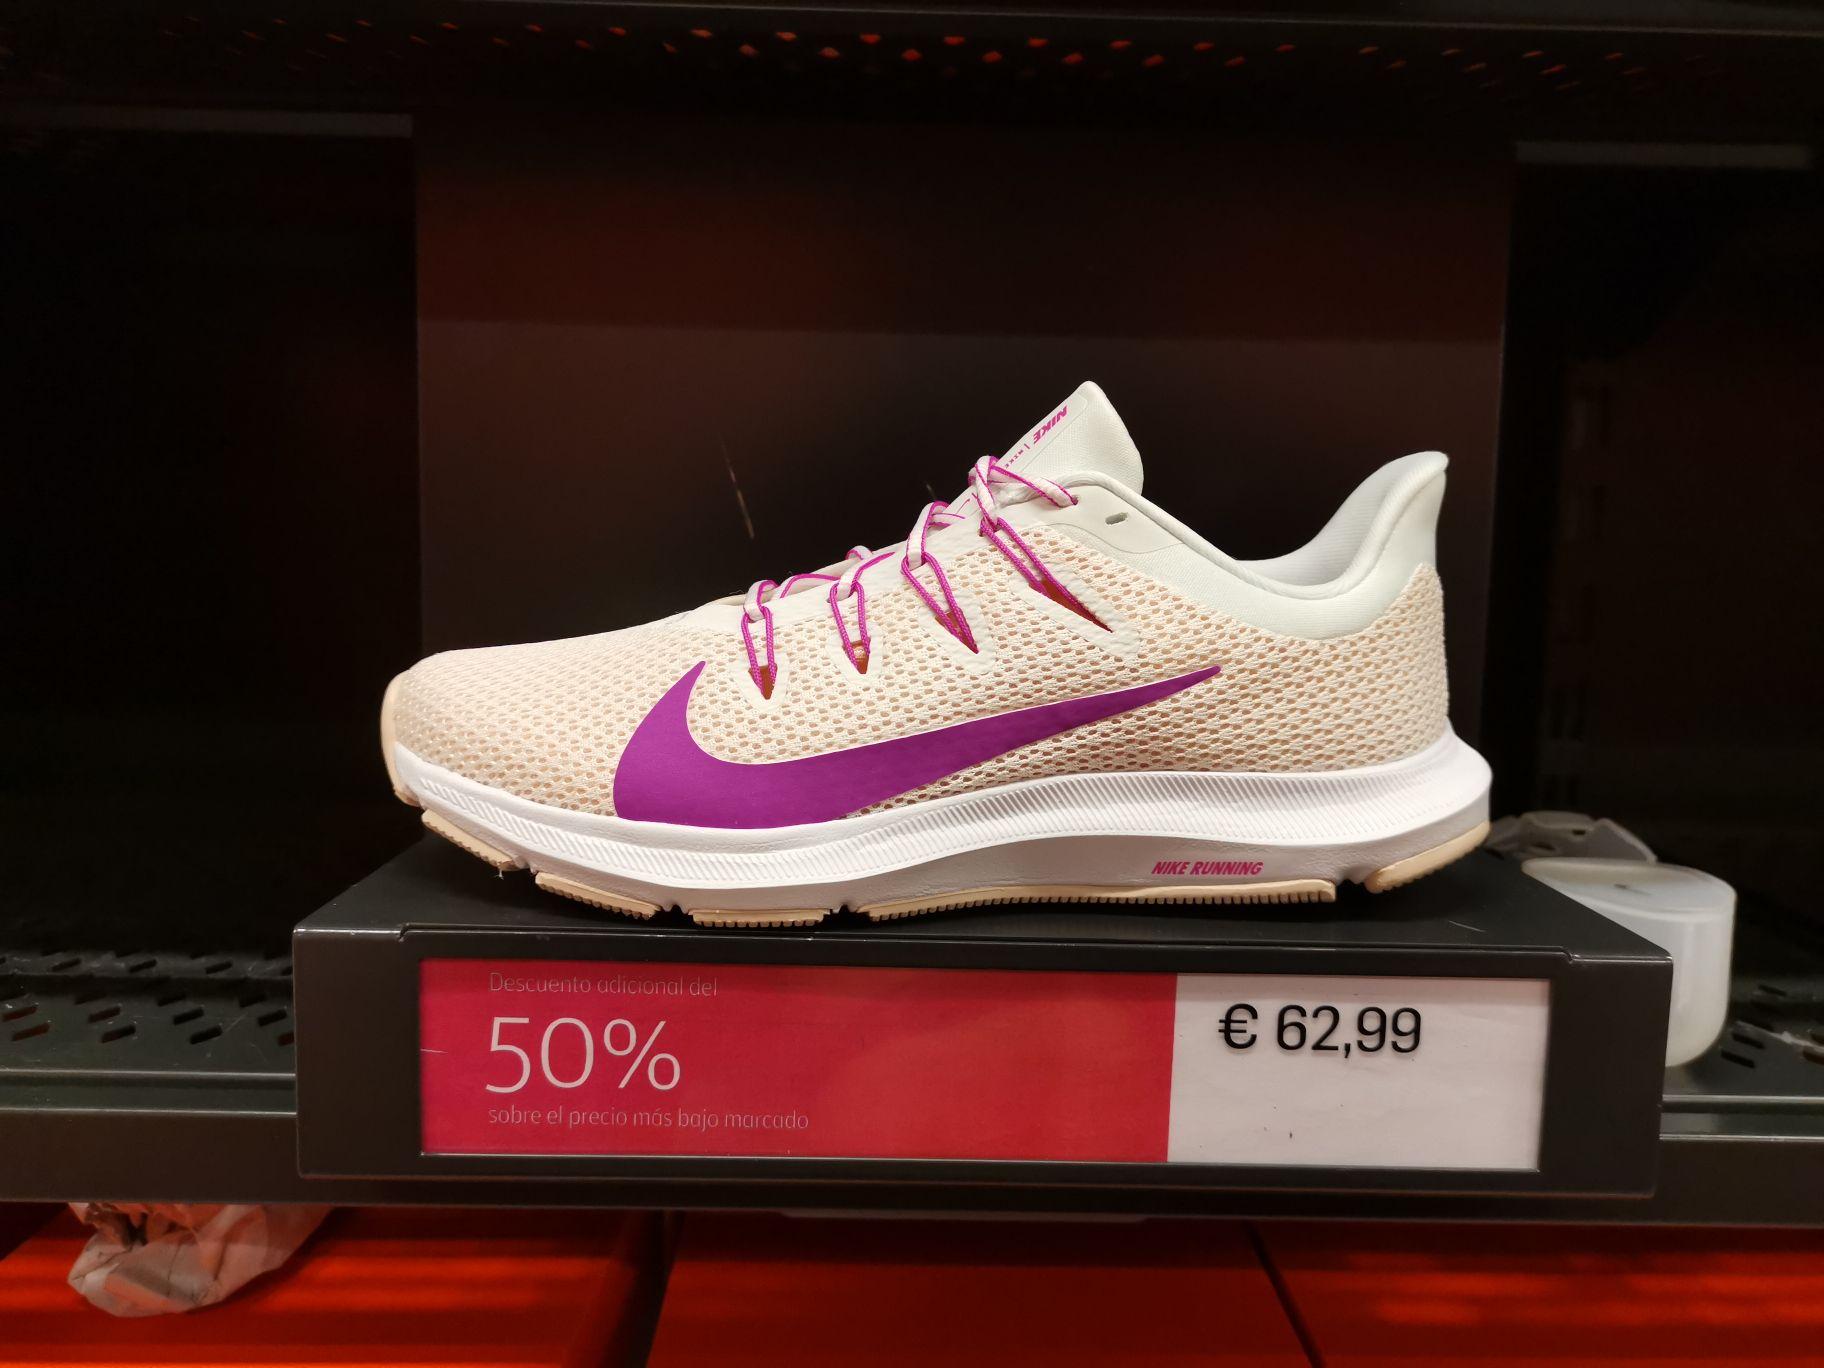 Nike Quest Nike Outlet San Sebastián de los reyes